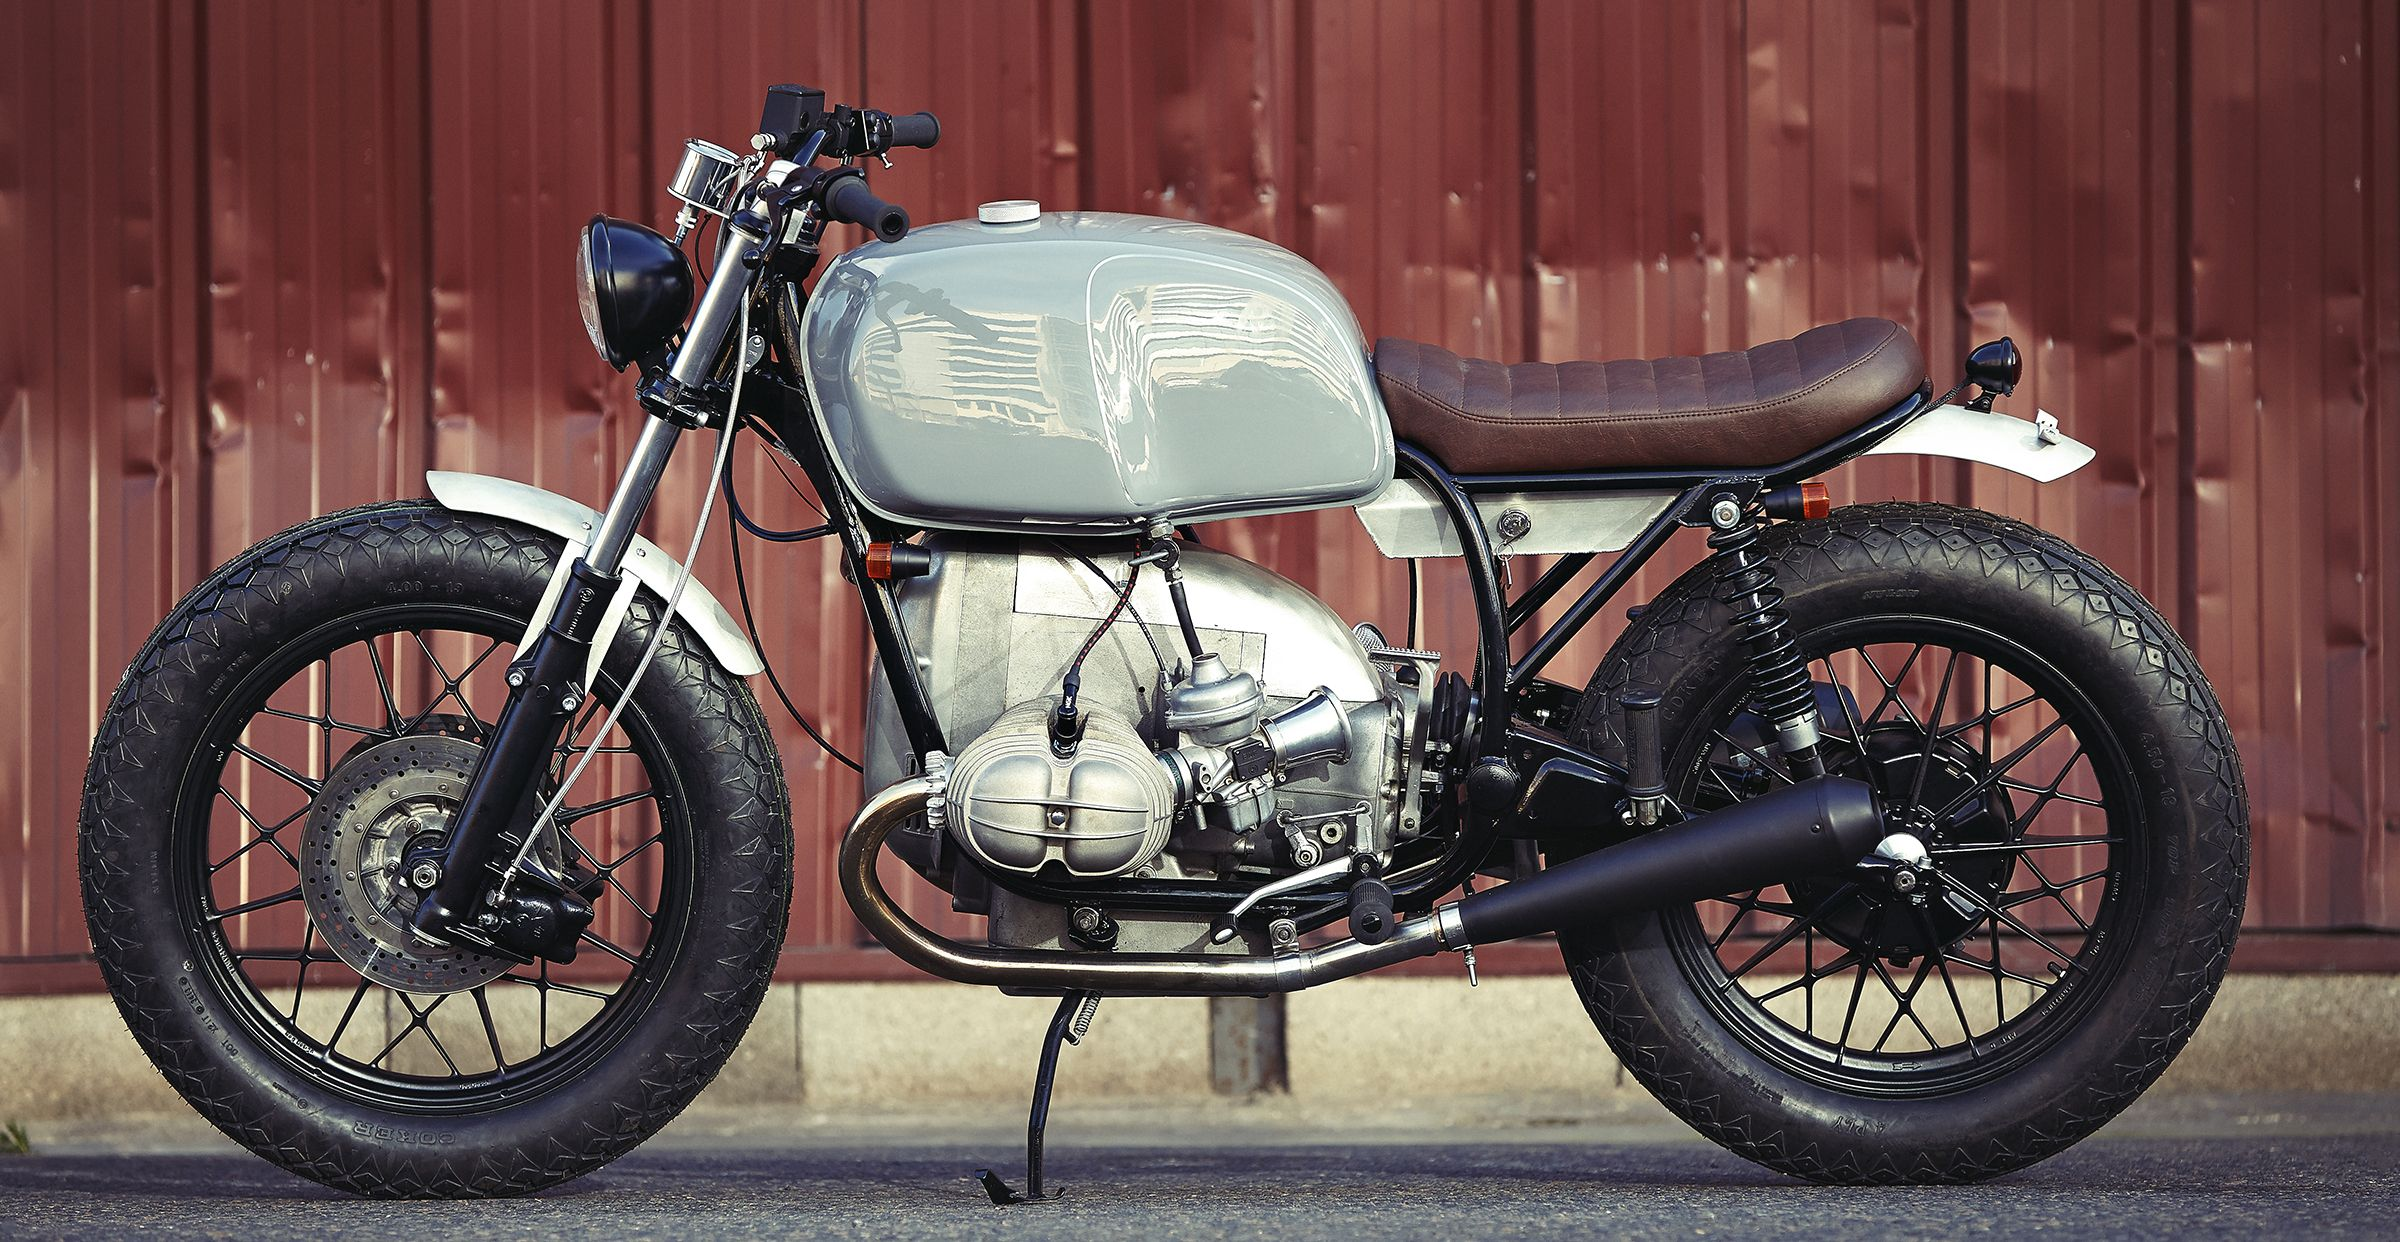 bmw r100 – clutch custom motorcycles | travel & bikes | pinterest